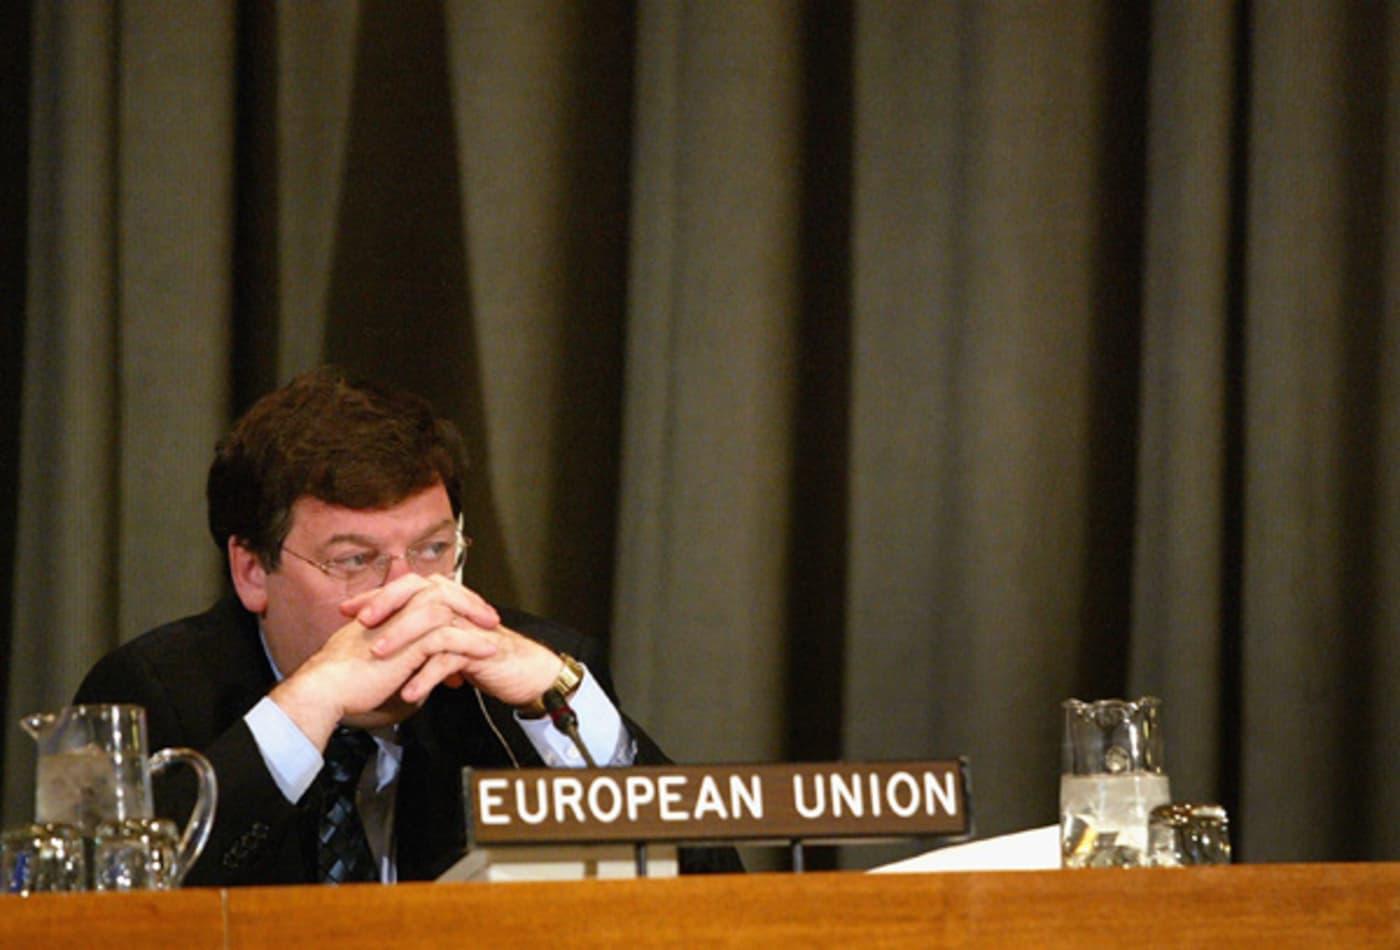 CNBC_Major_Events_Eurozone_Cowen.jpg